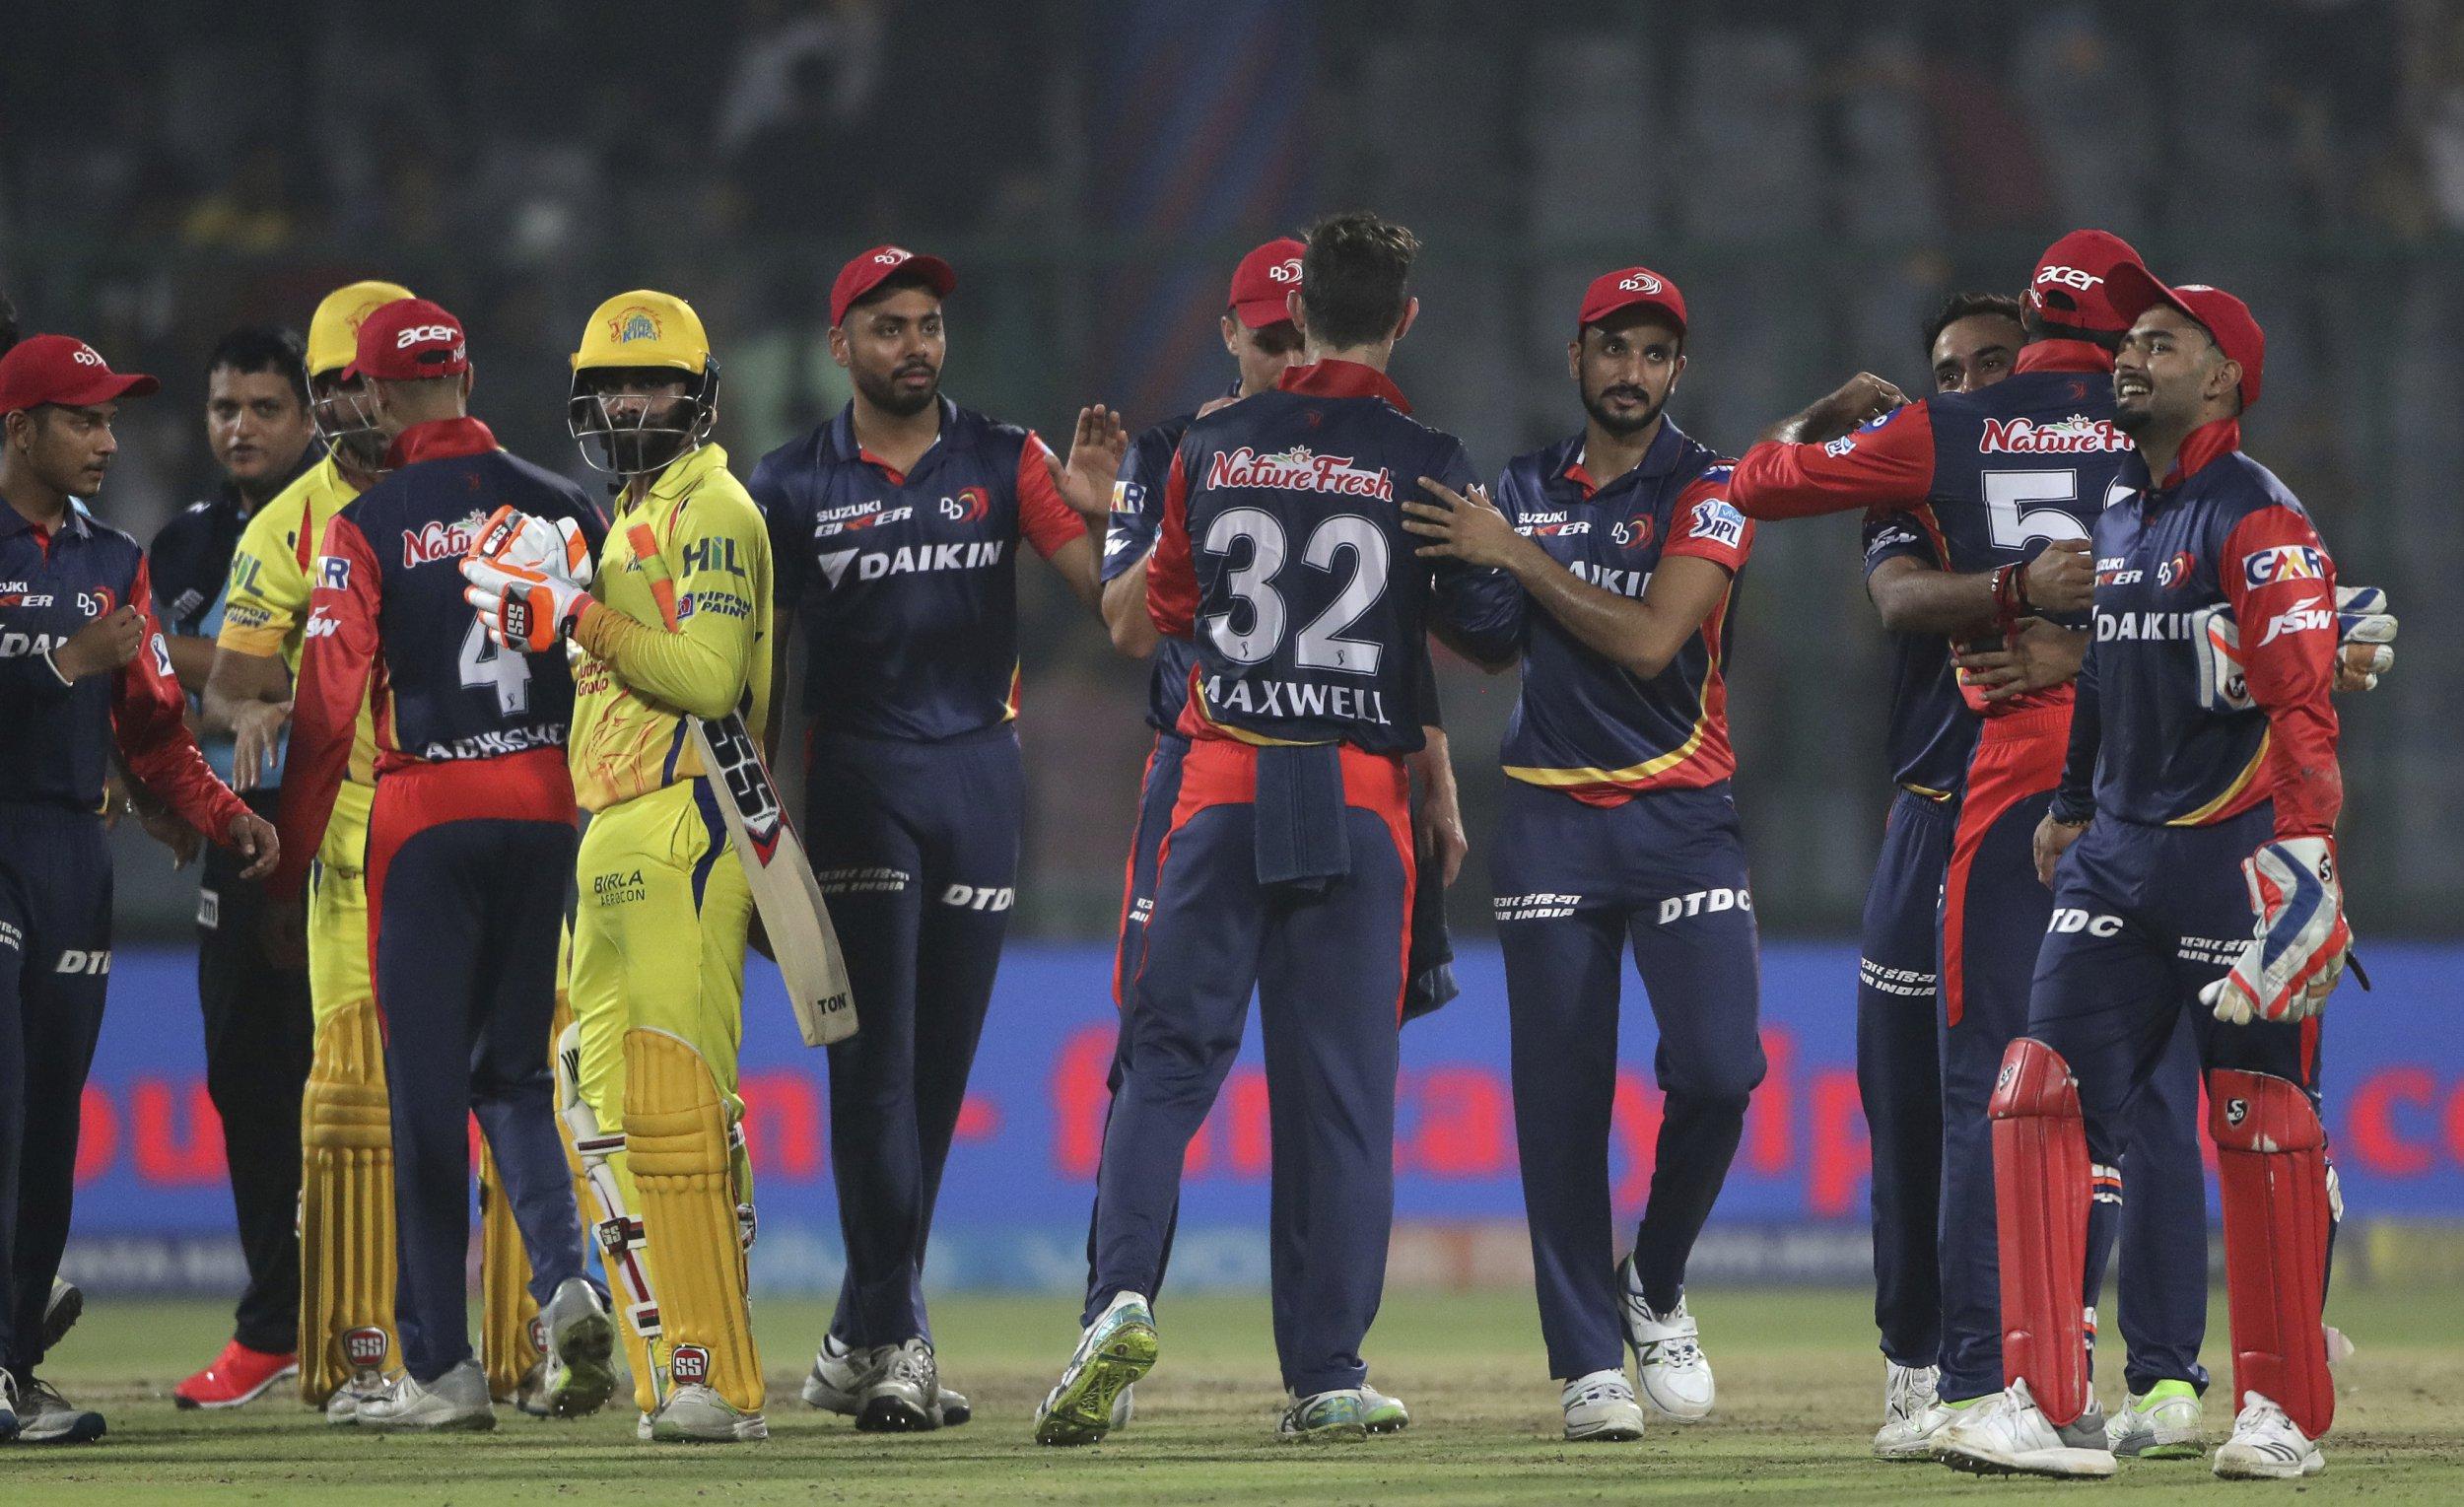 Delhi v Mumbai betting: IPL spinning stars Amit Mishra and Mayank Markande worth backing